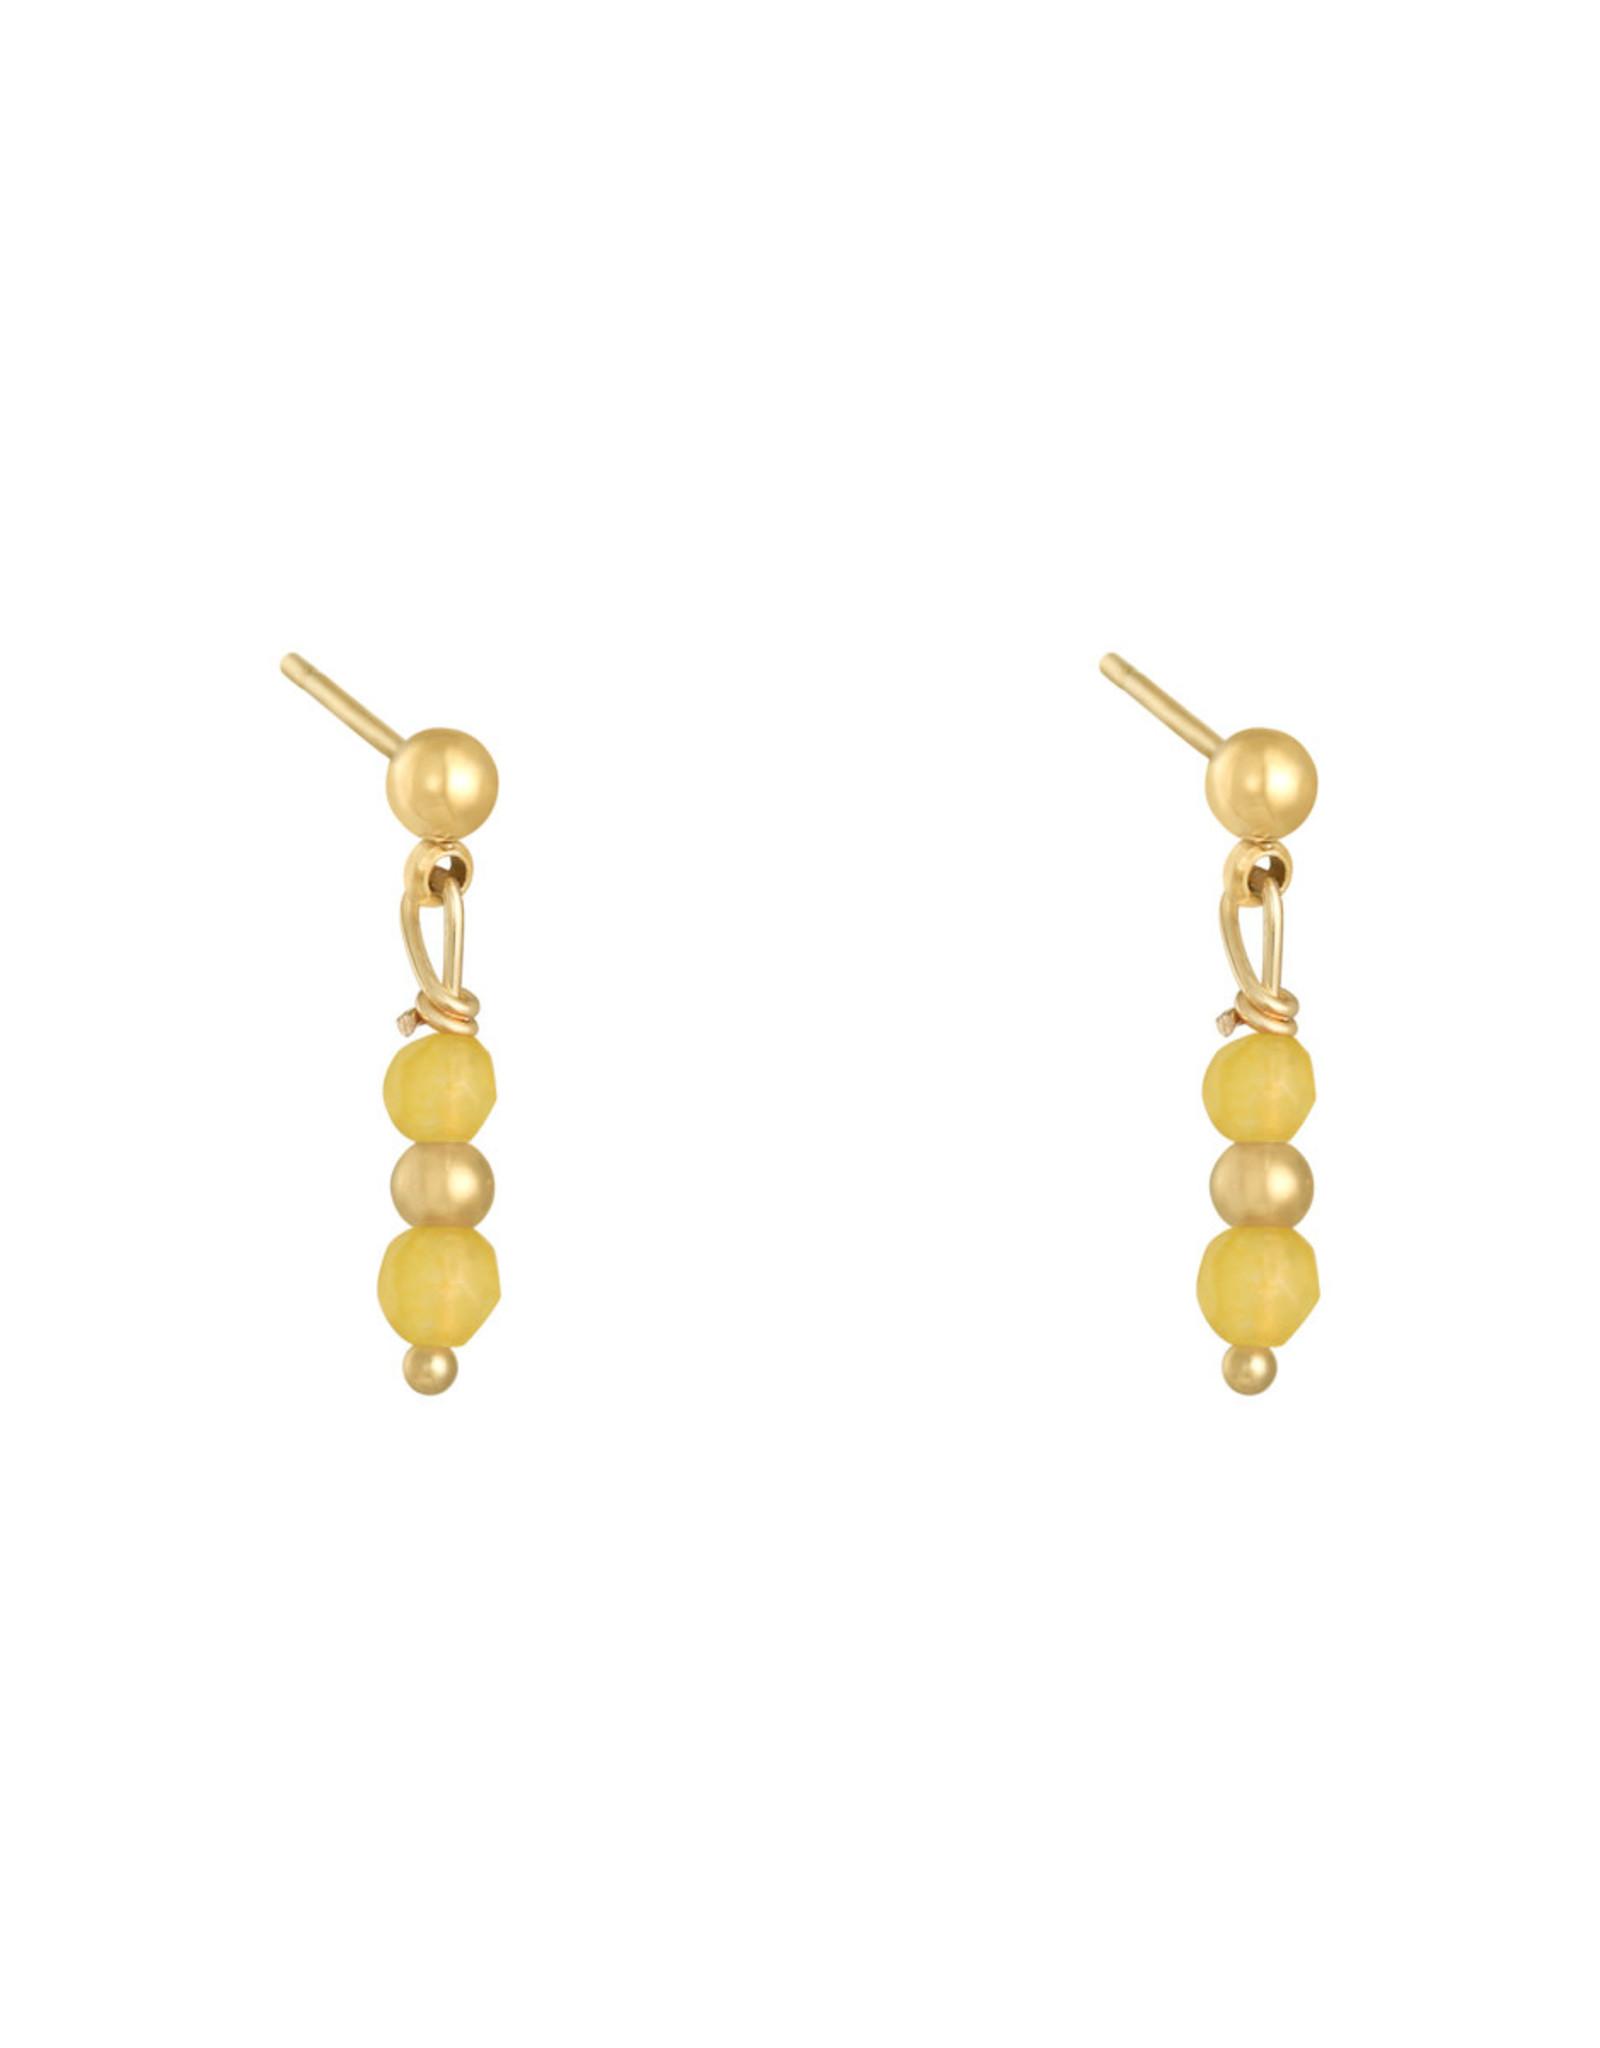 Earring in a row yellow